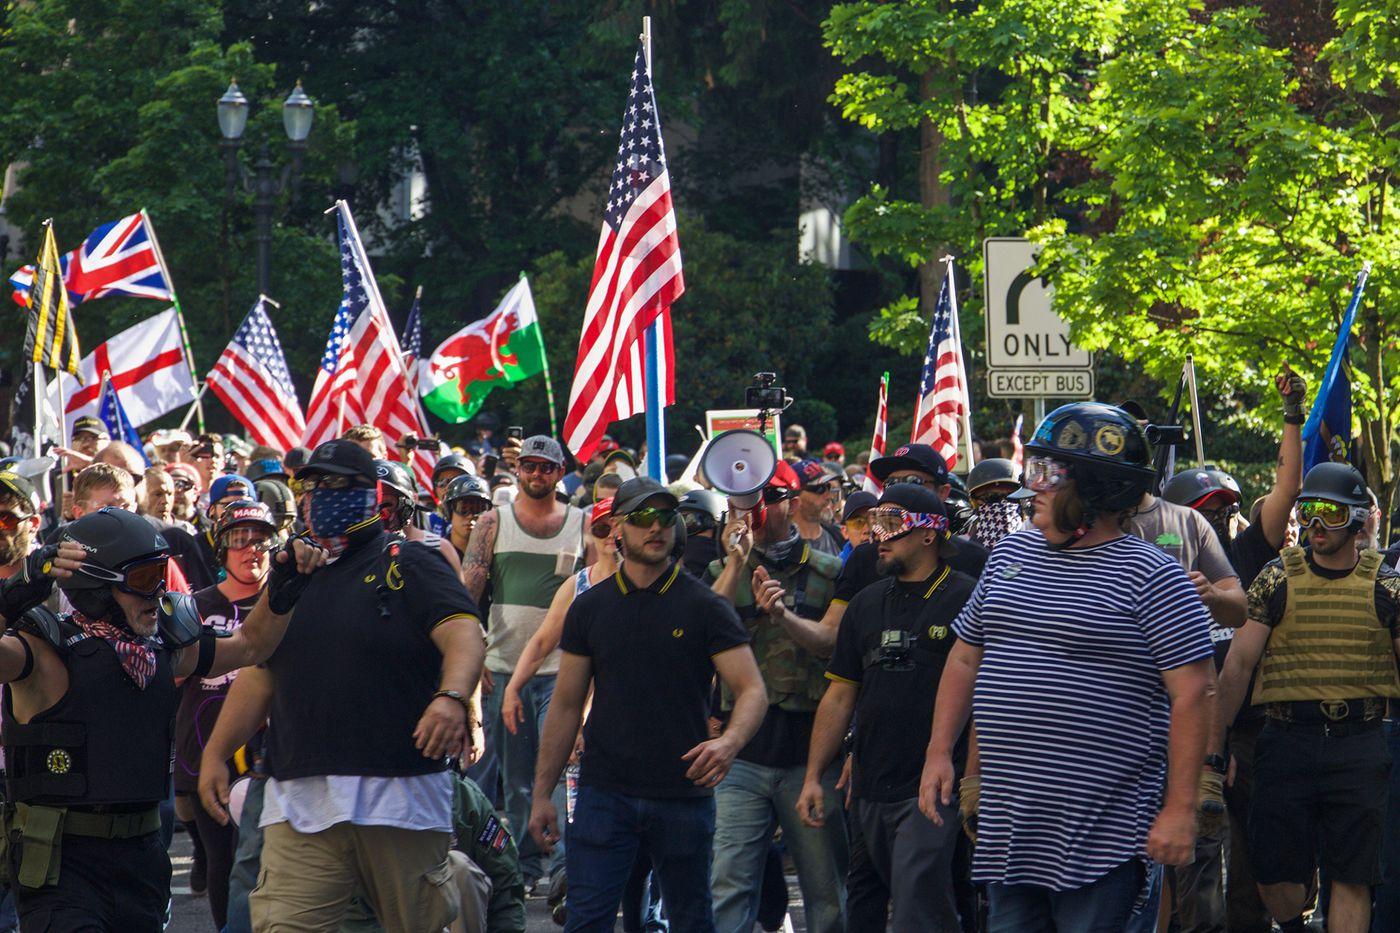 Group organizing pro-America, pro-Trump rally says it won't tolerate racists